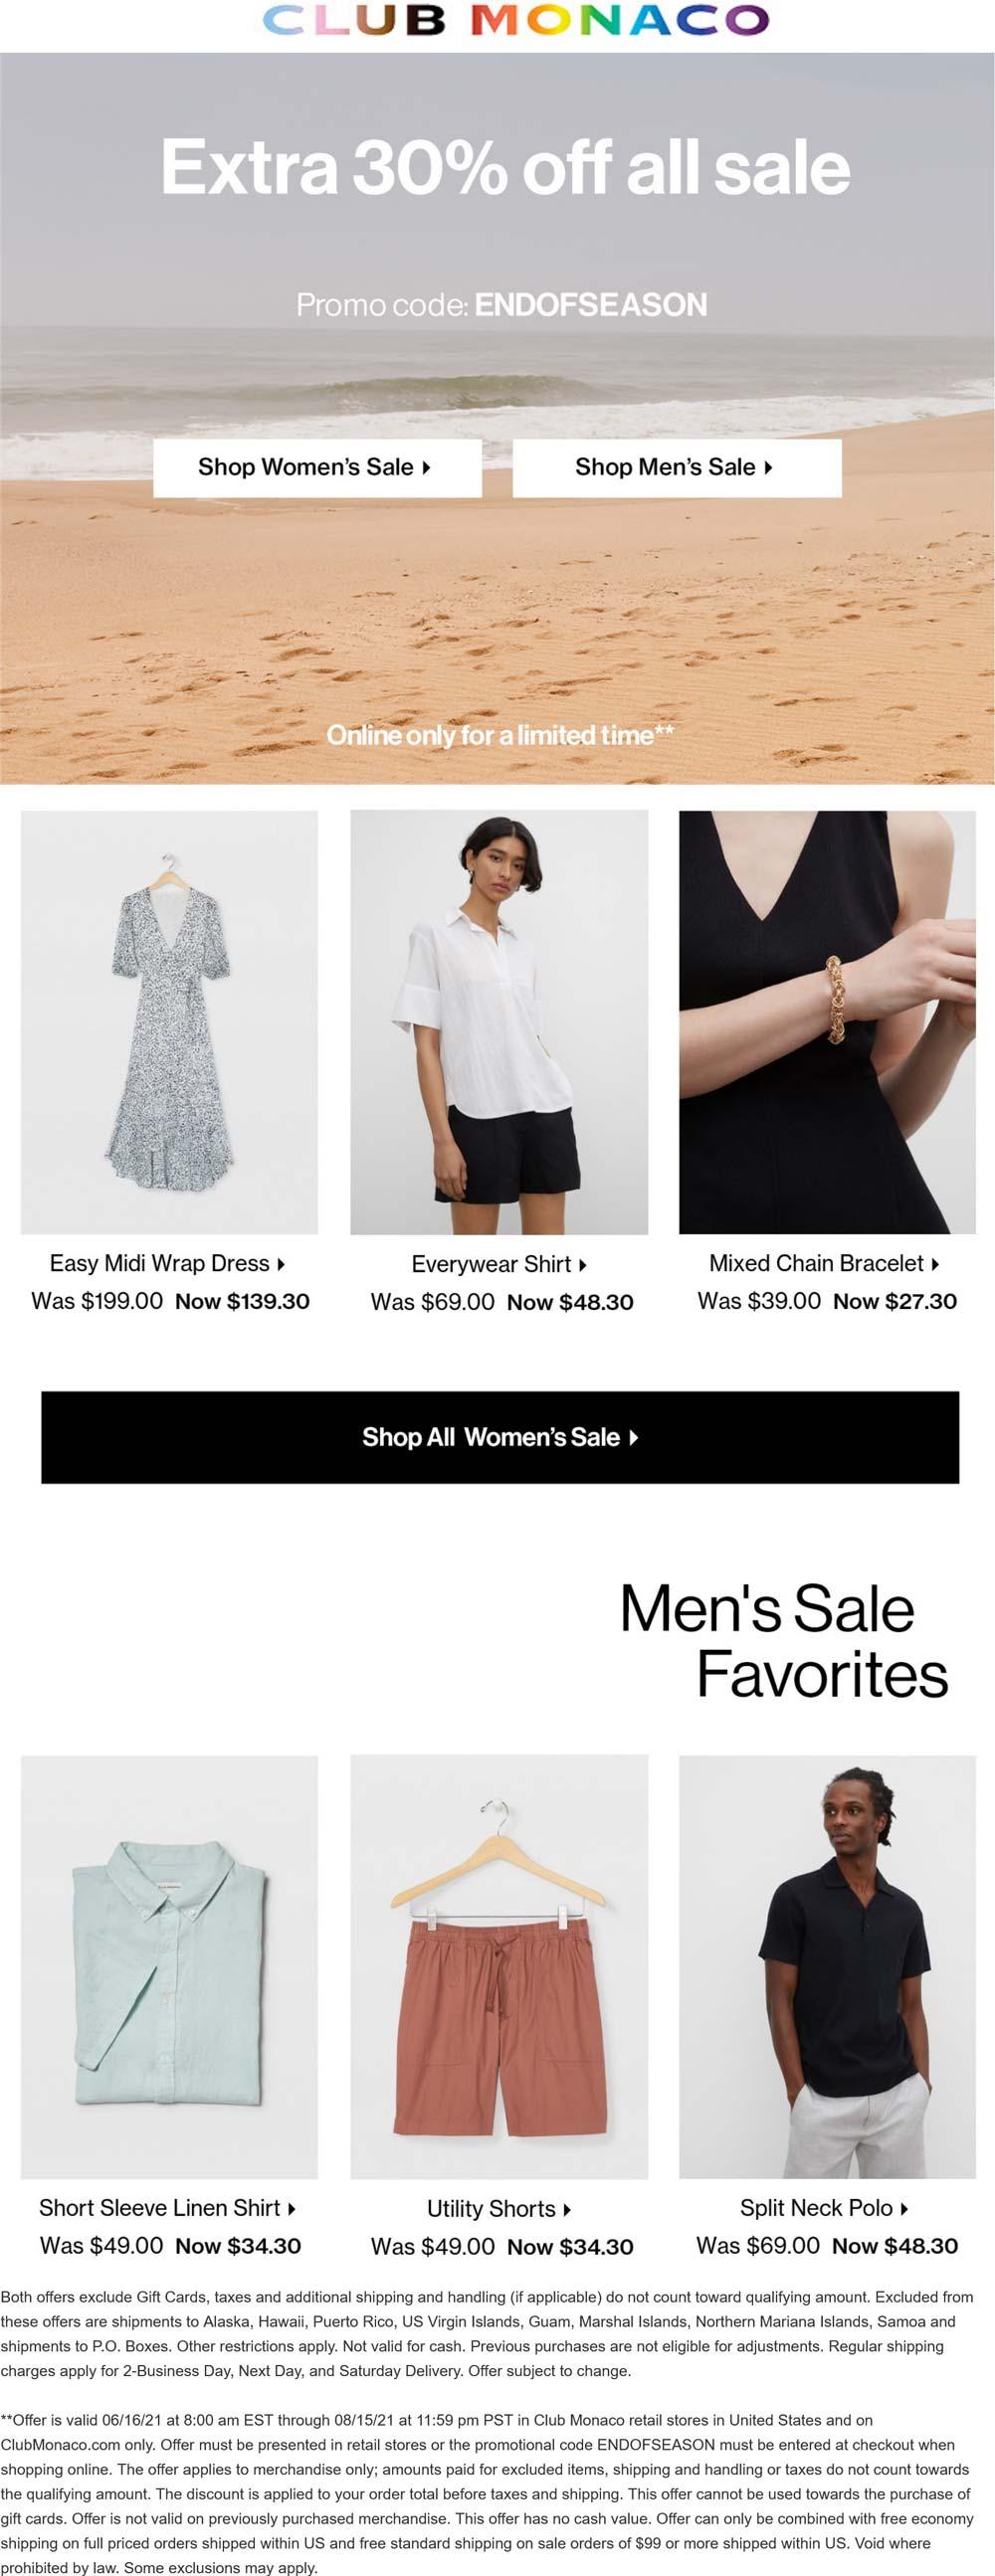 Club Monaco stores Coupon  Extra 30% off sale items at Club Monaco, or online via promo code ENDOFSEASON #clubmonaco